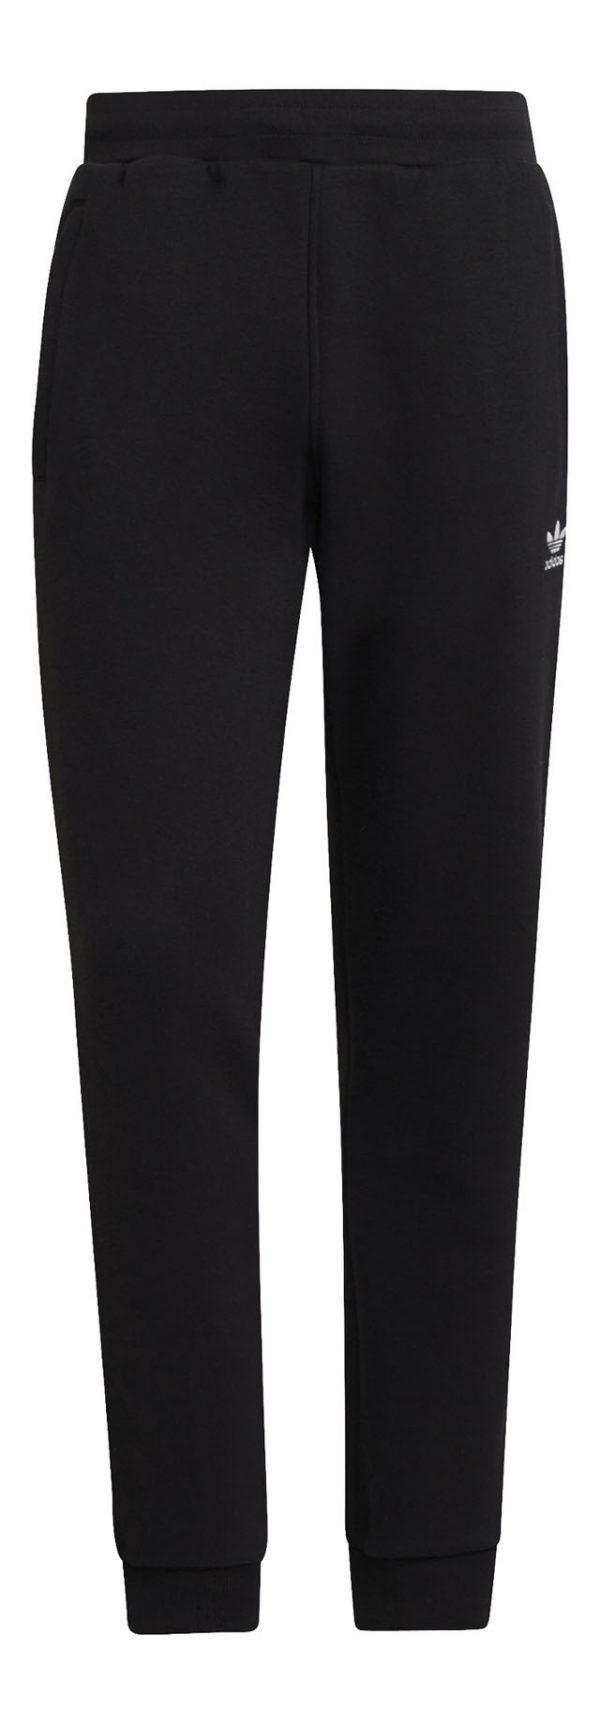 Spodnie adidas Essential H34657 Rozmiar S (173cm)